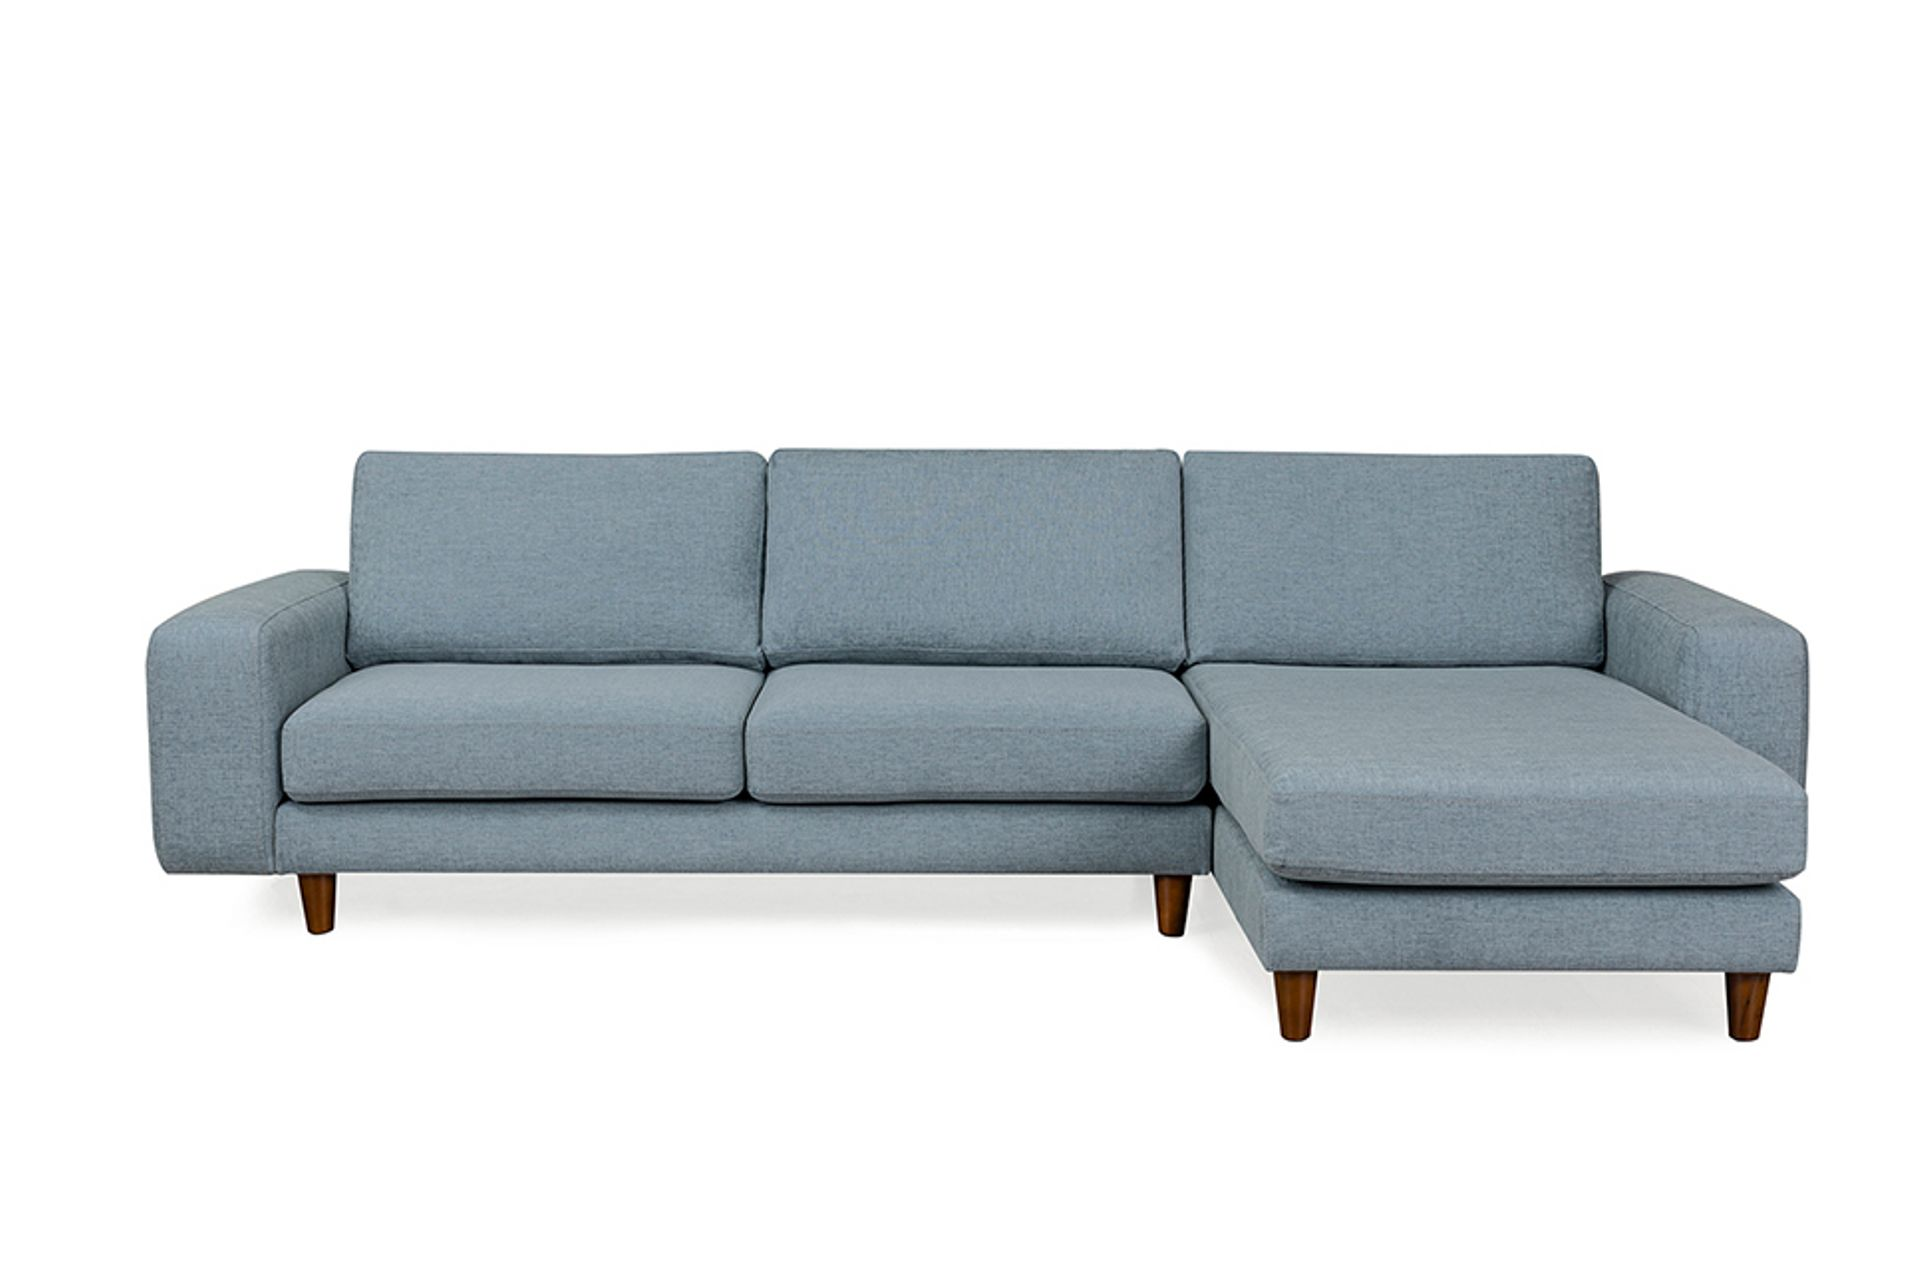 Merlin Corner Chaise Sofa, Right, Blue